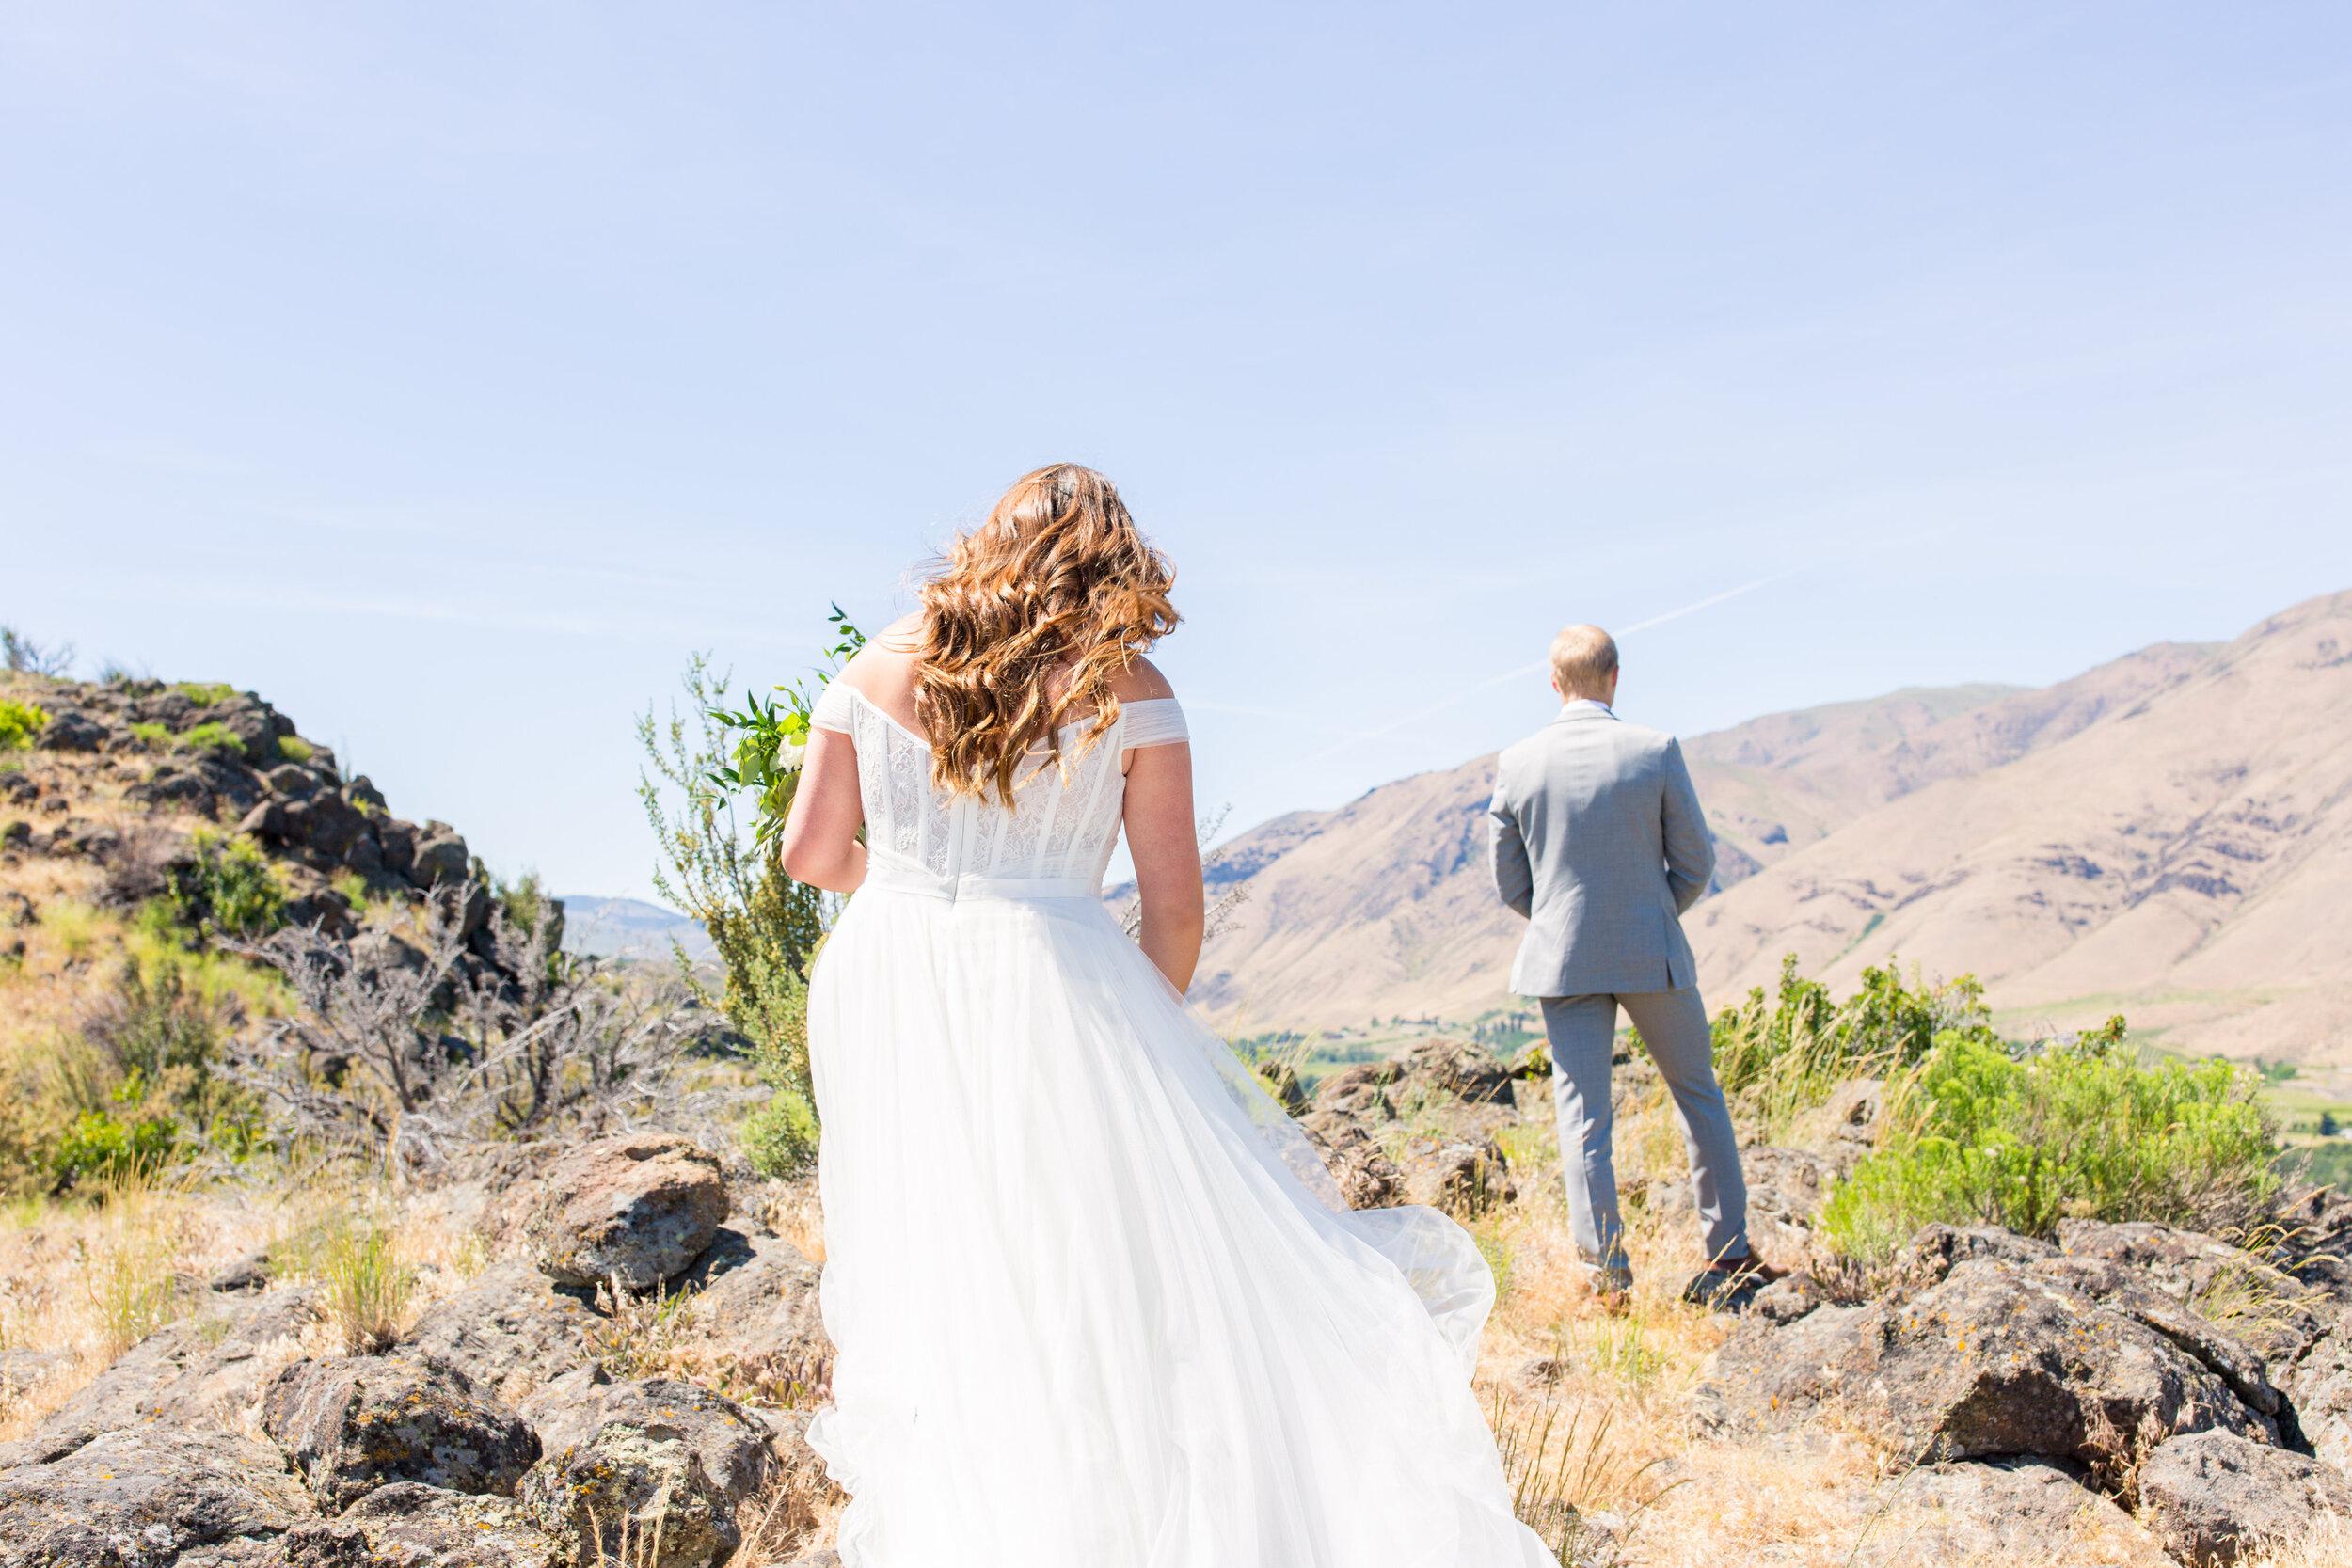 orchard winery spokane wedding bride and groom first look